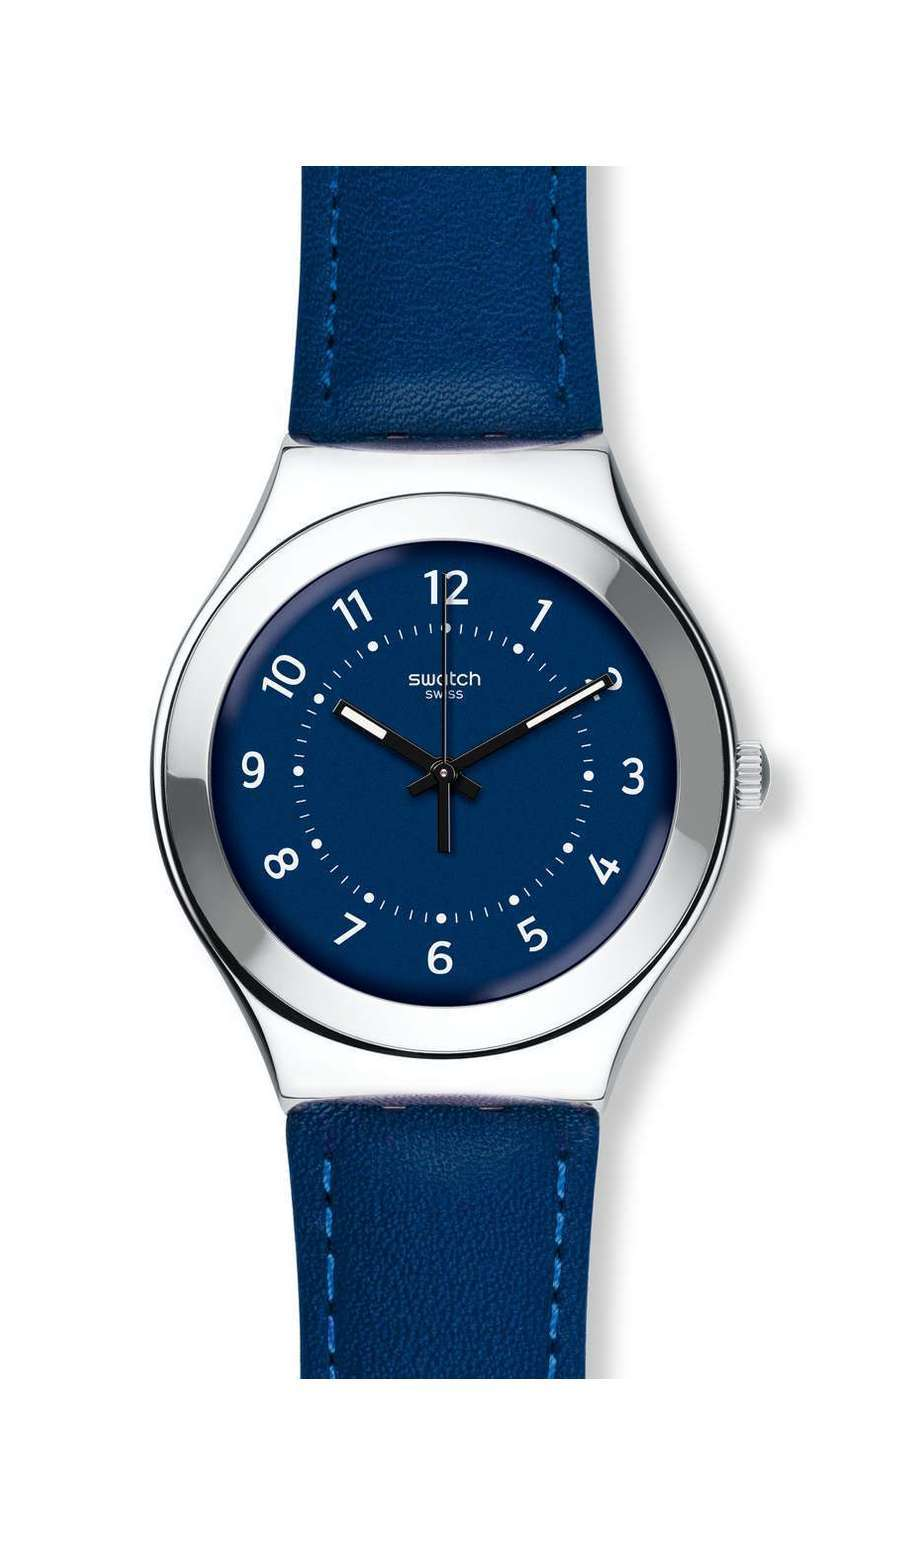 Swatch - NIGHT TWIST - 1